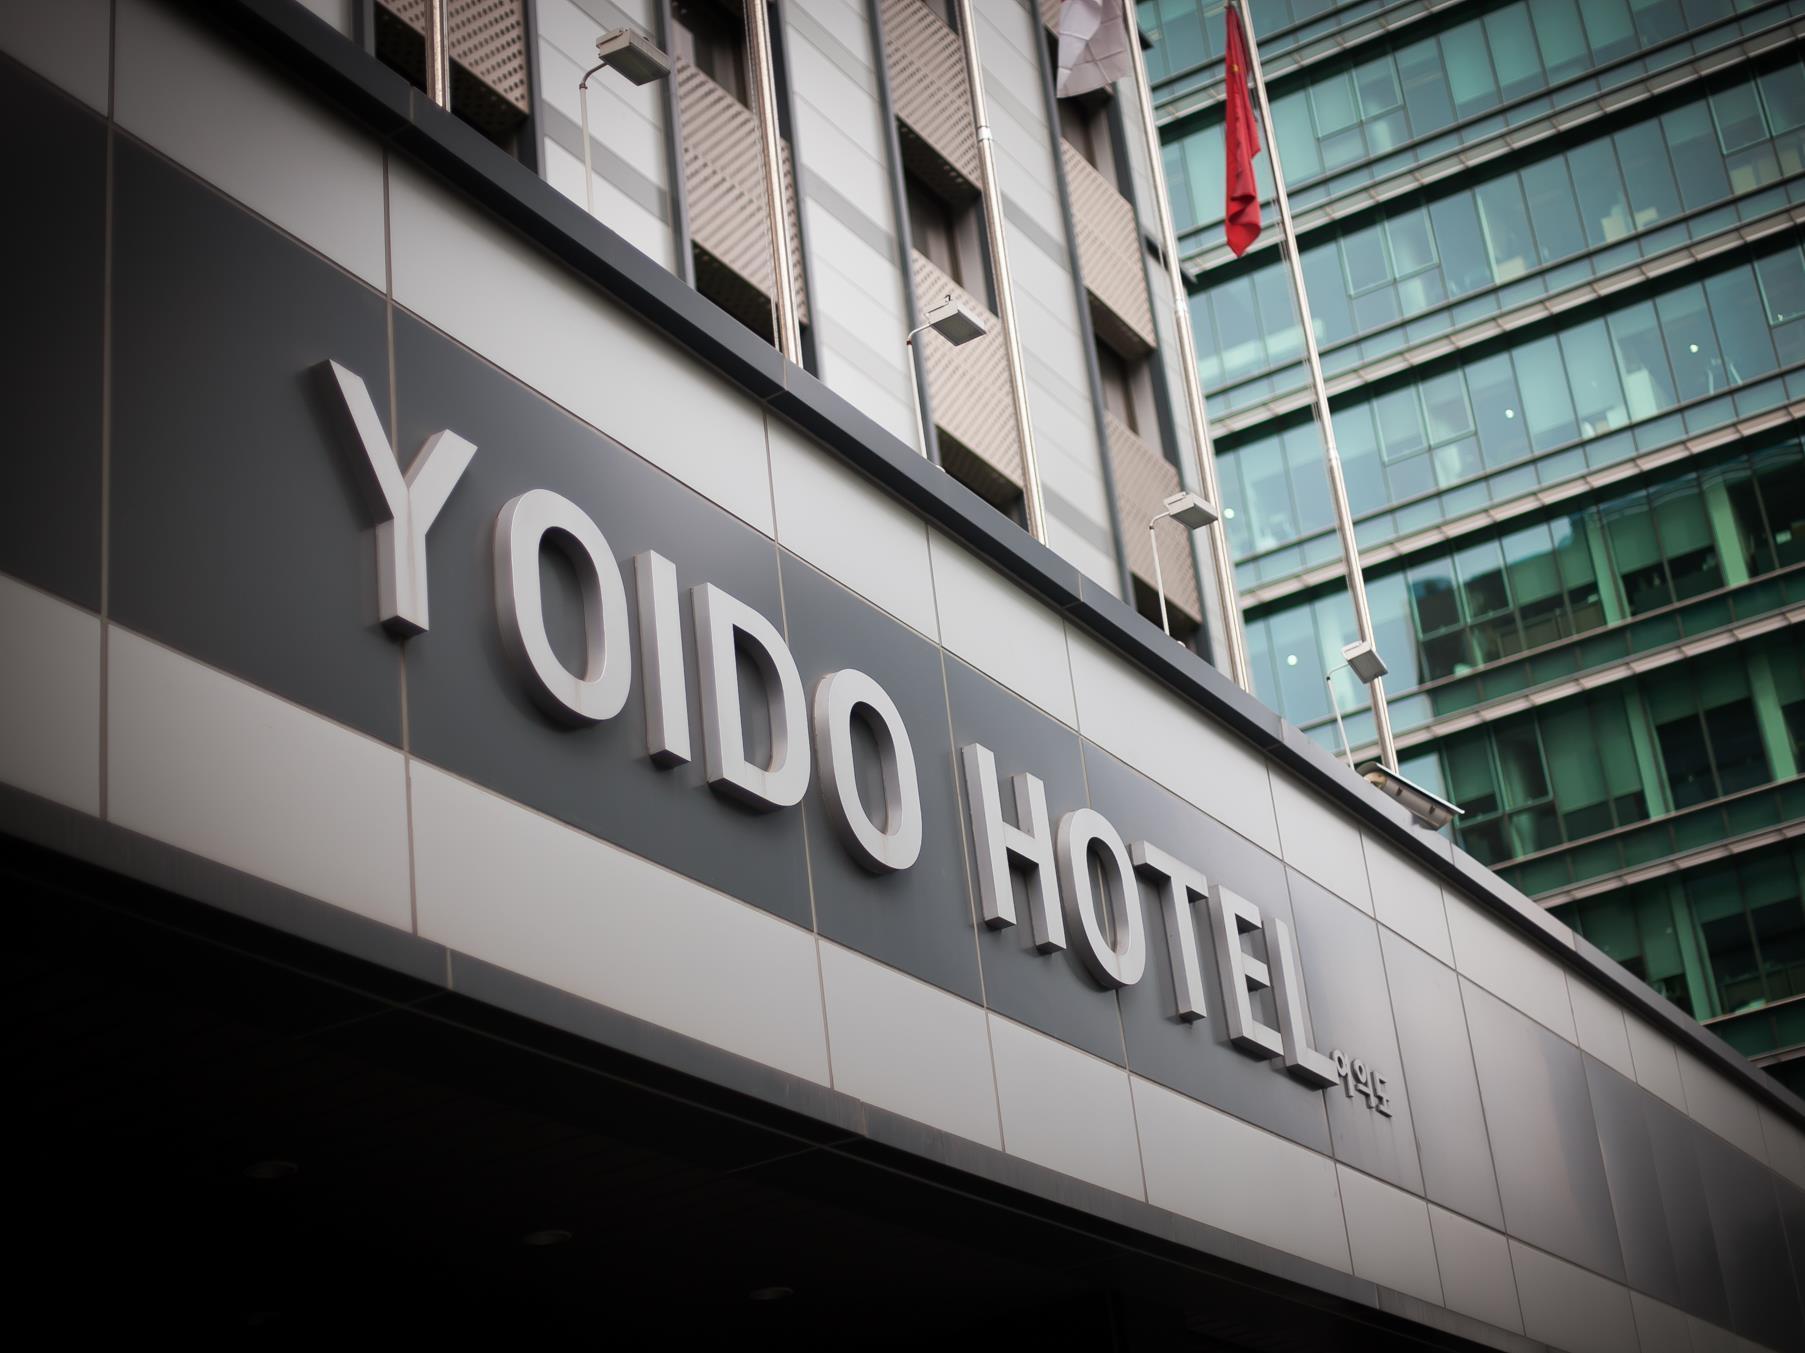 Hotel Yoido